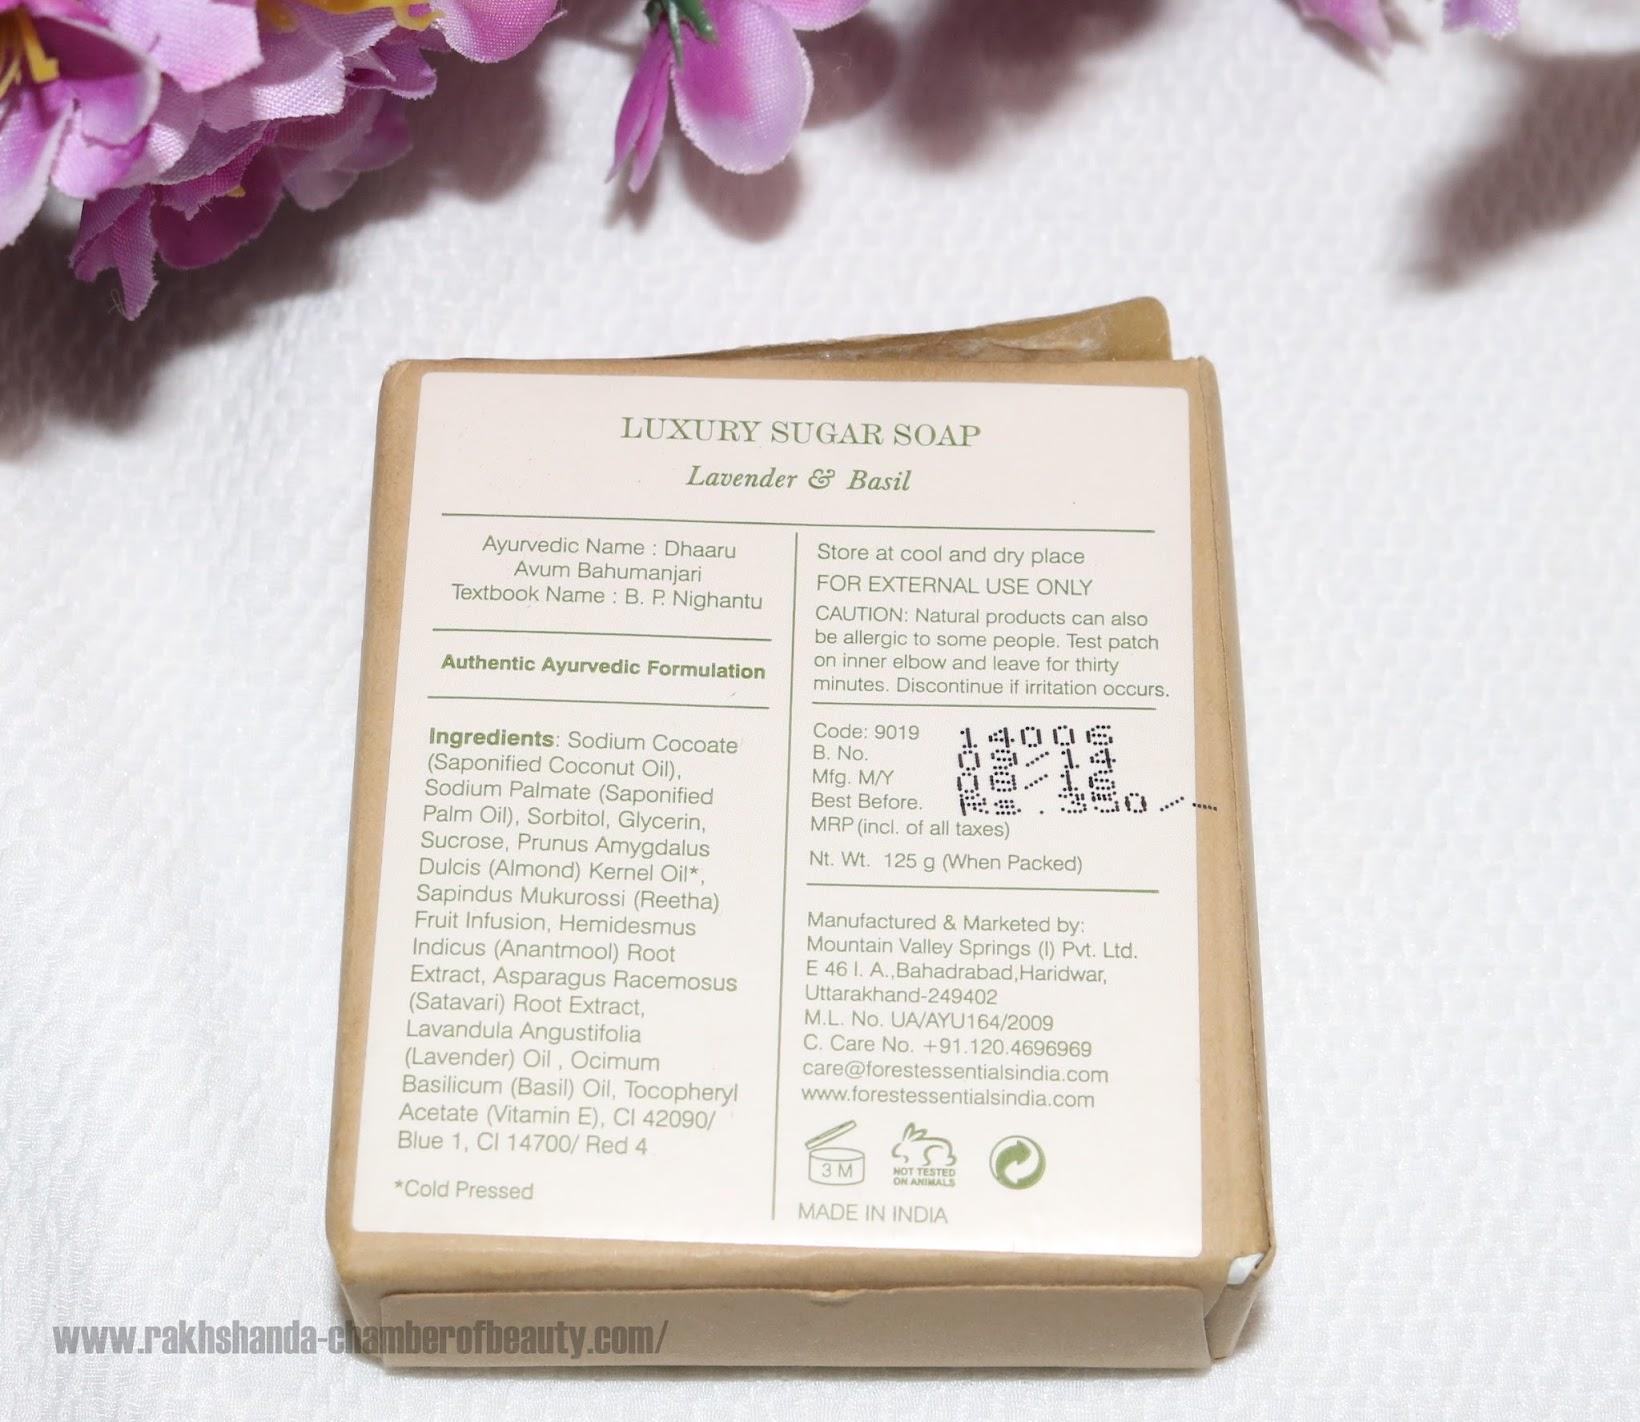 Forest Essentials Luxury Sugar Soap Lavender & Basil review